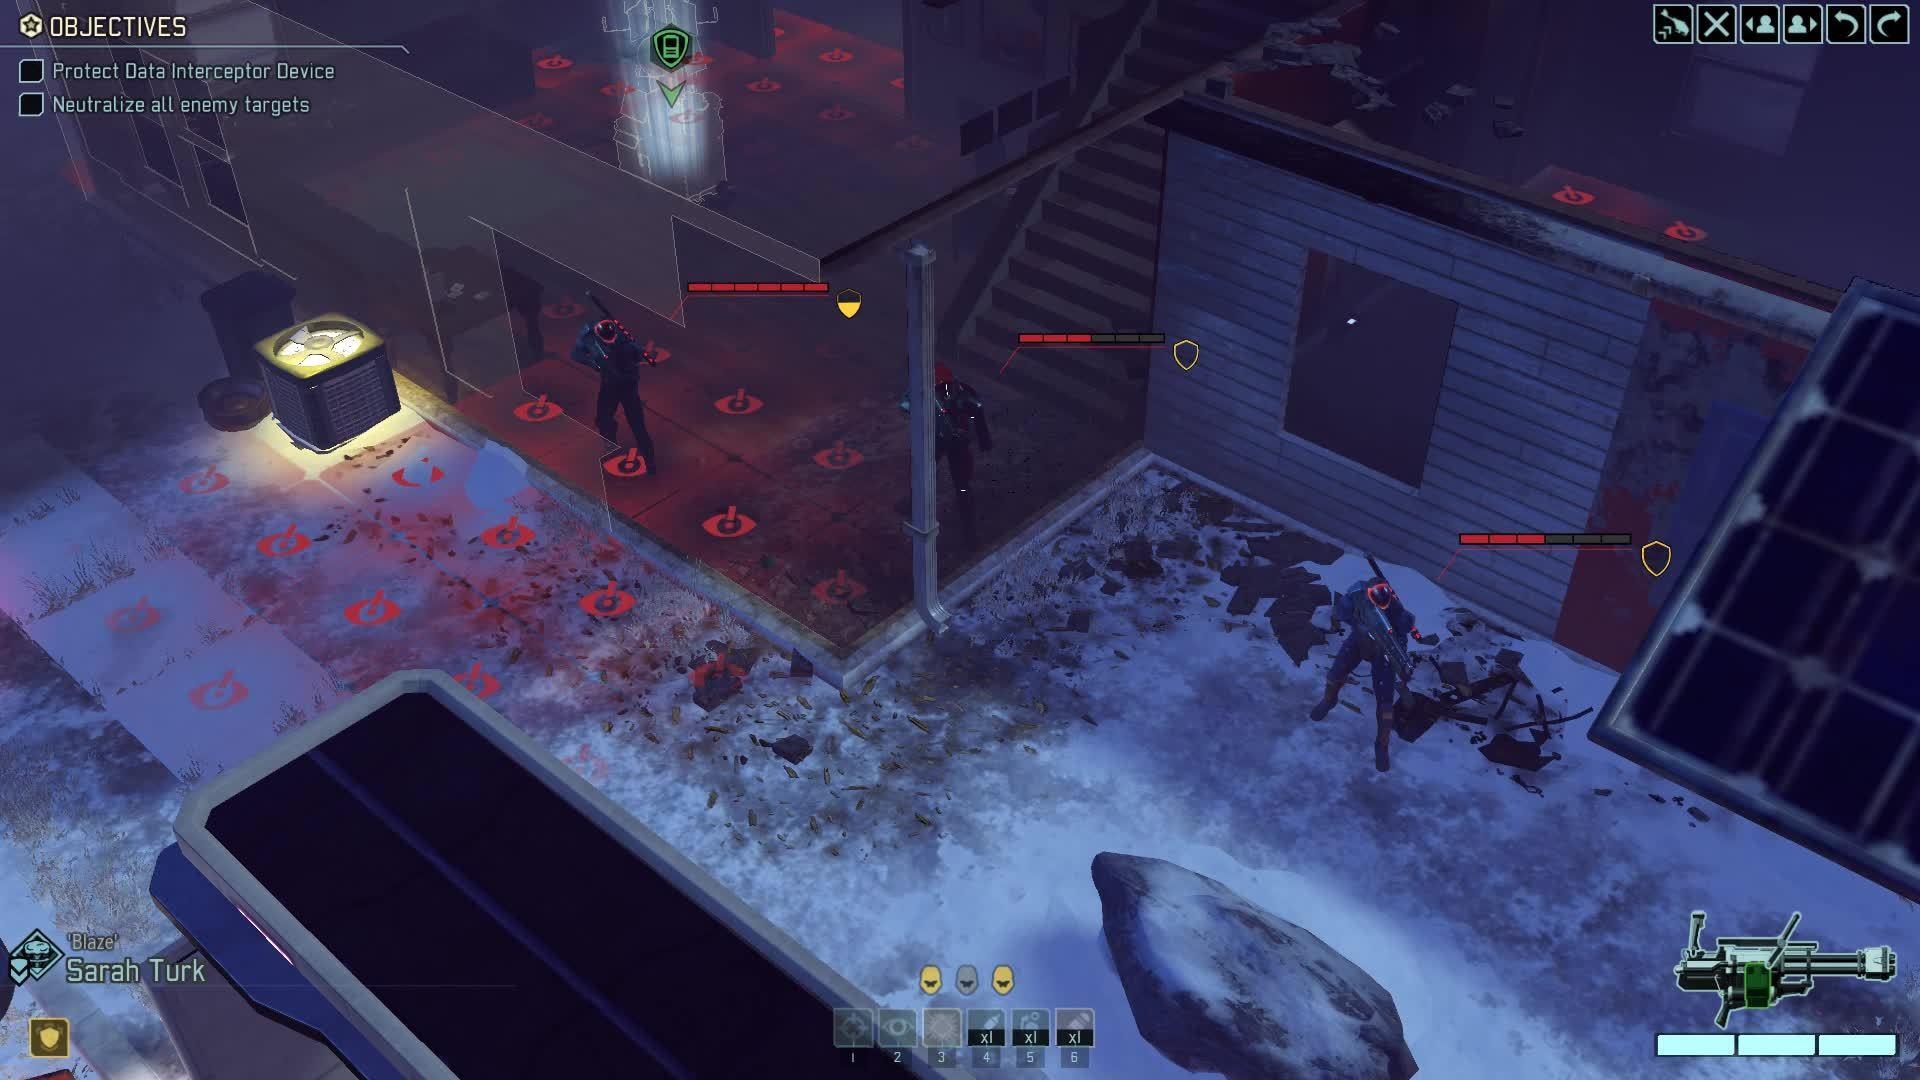 XCOM 2 overwatch ambush GIFs